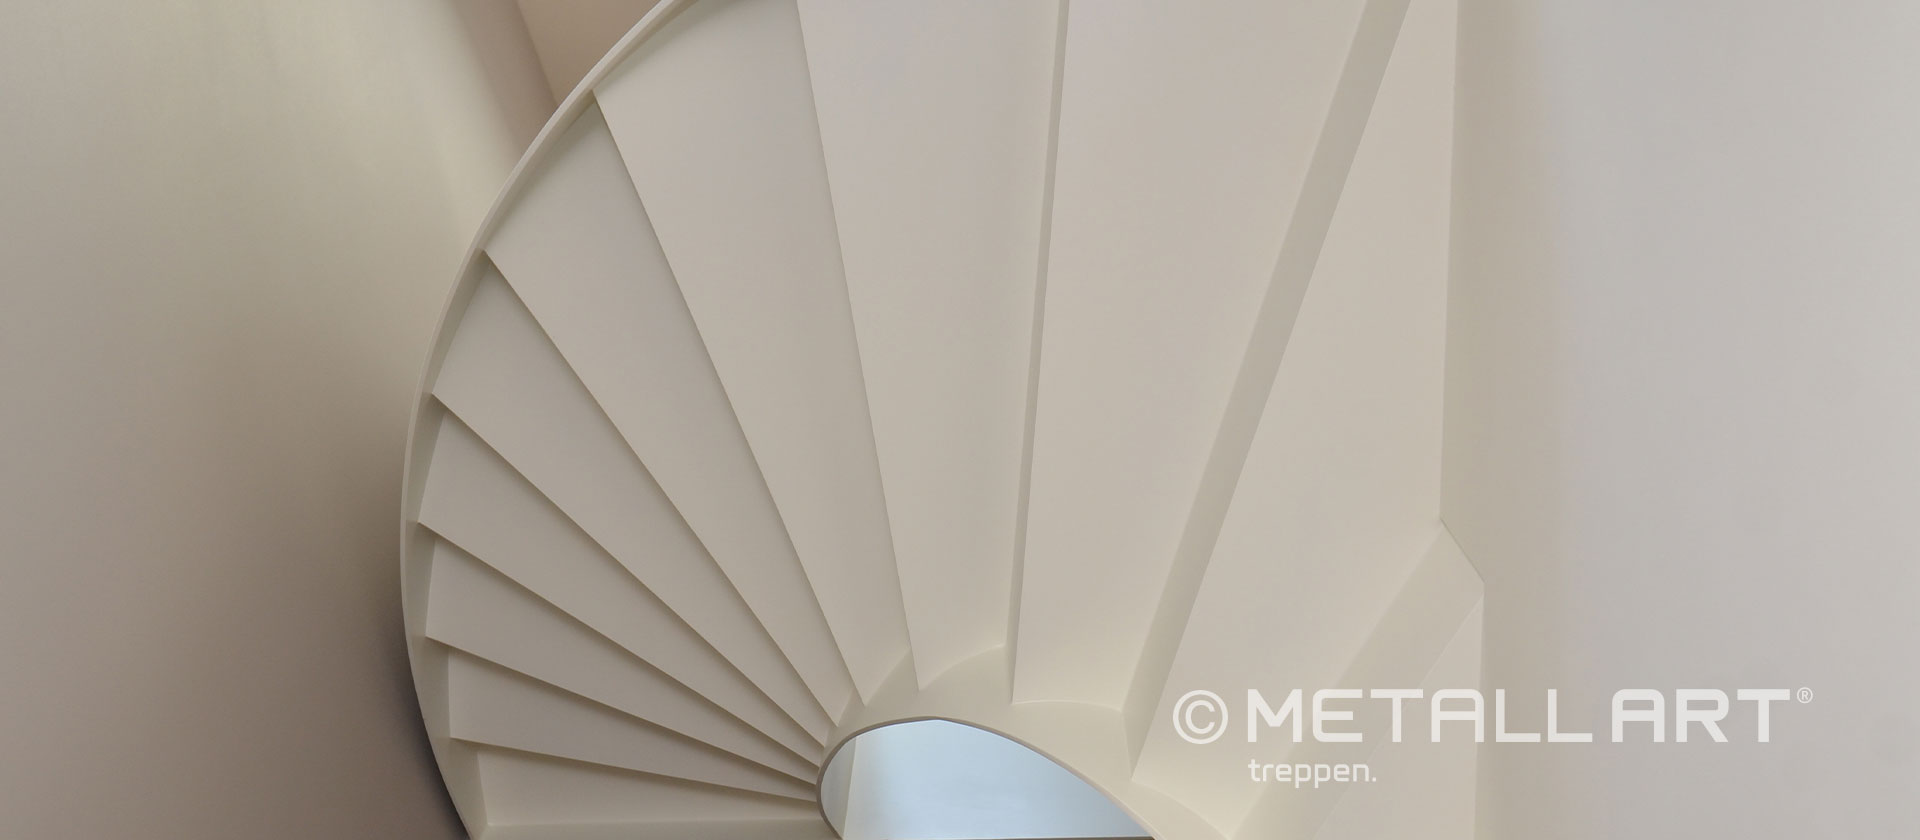 Treppe Wangen groß weiß